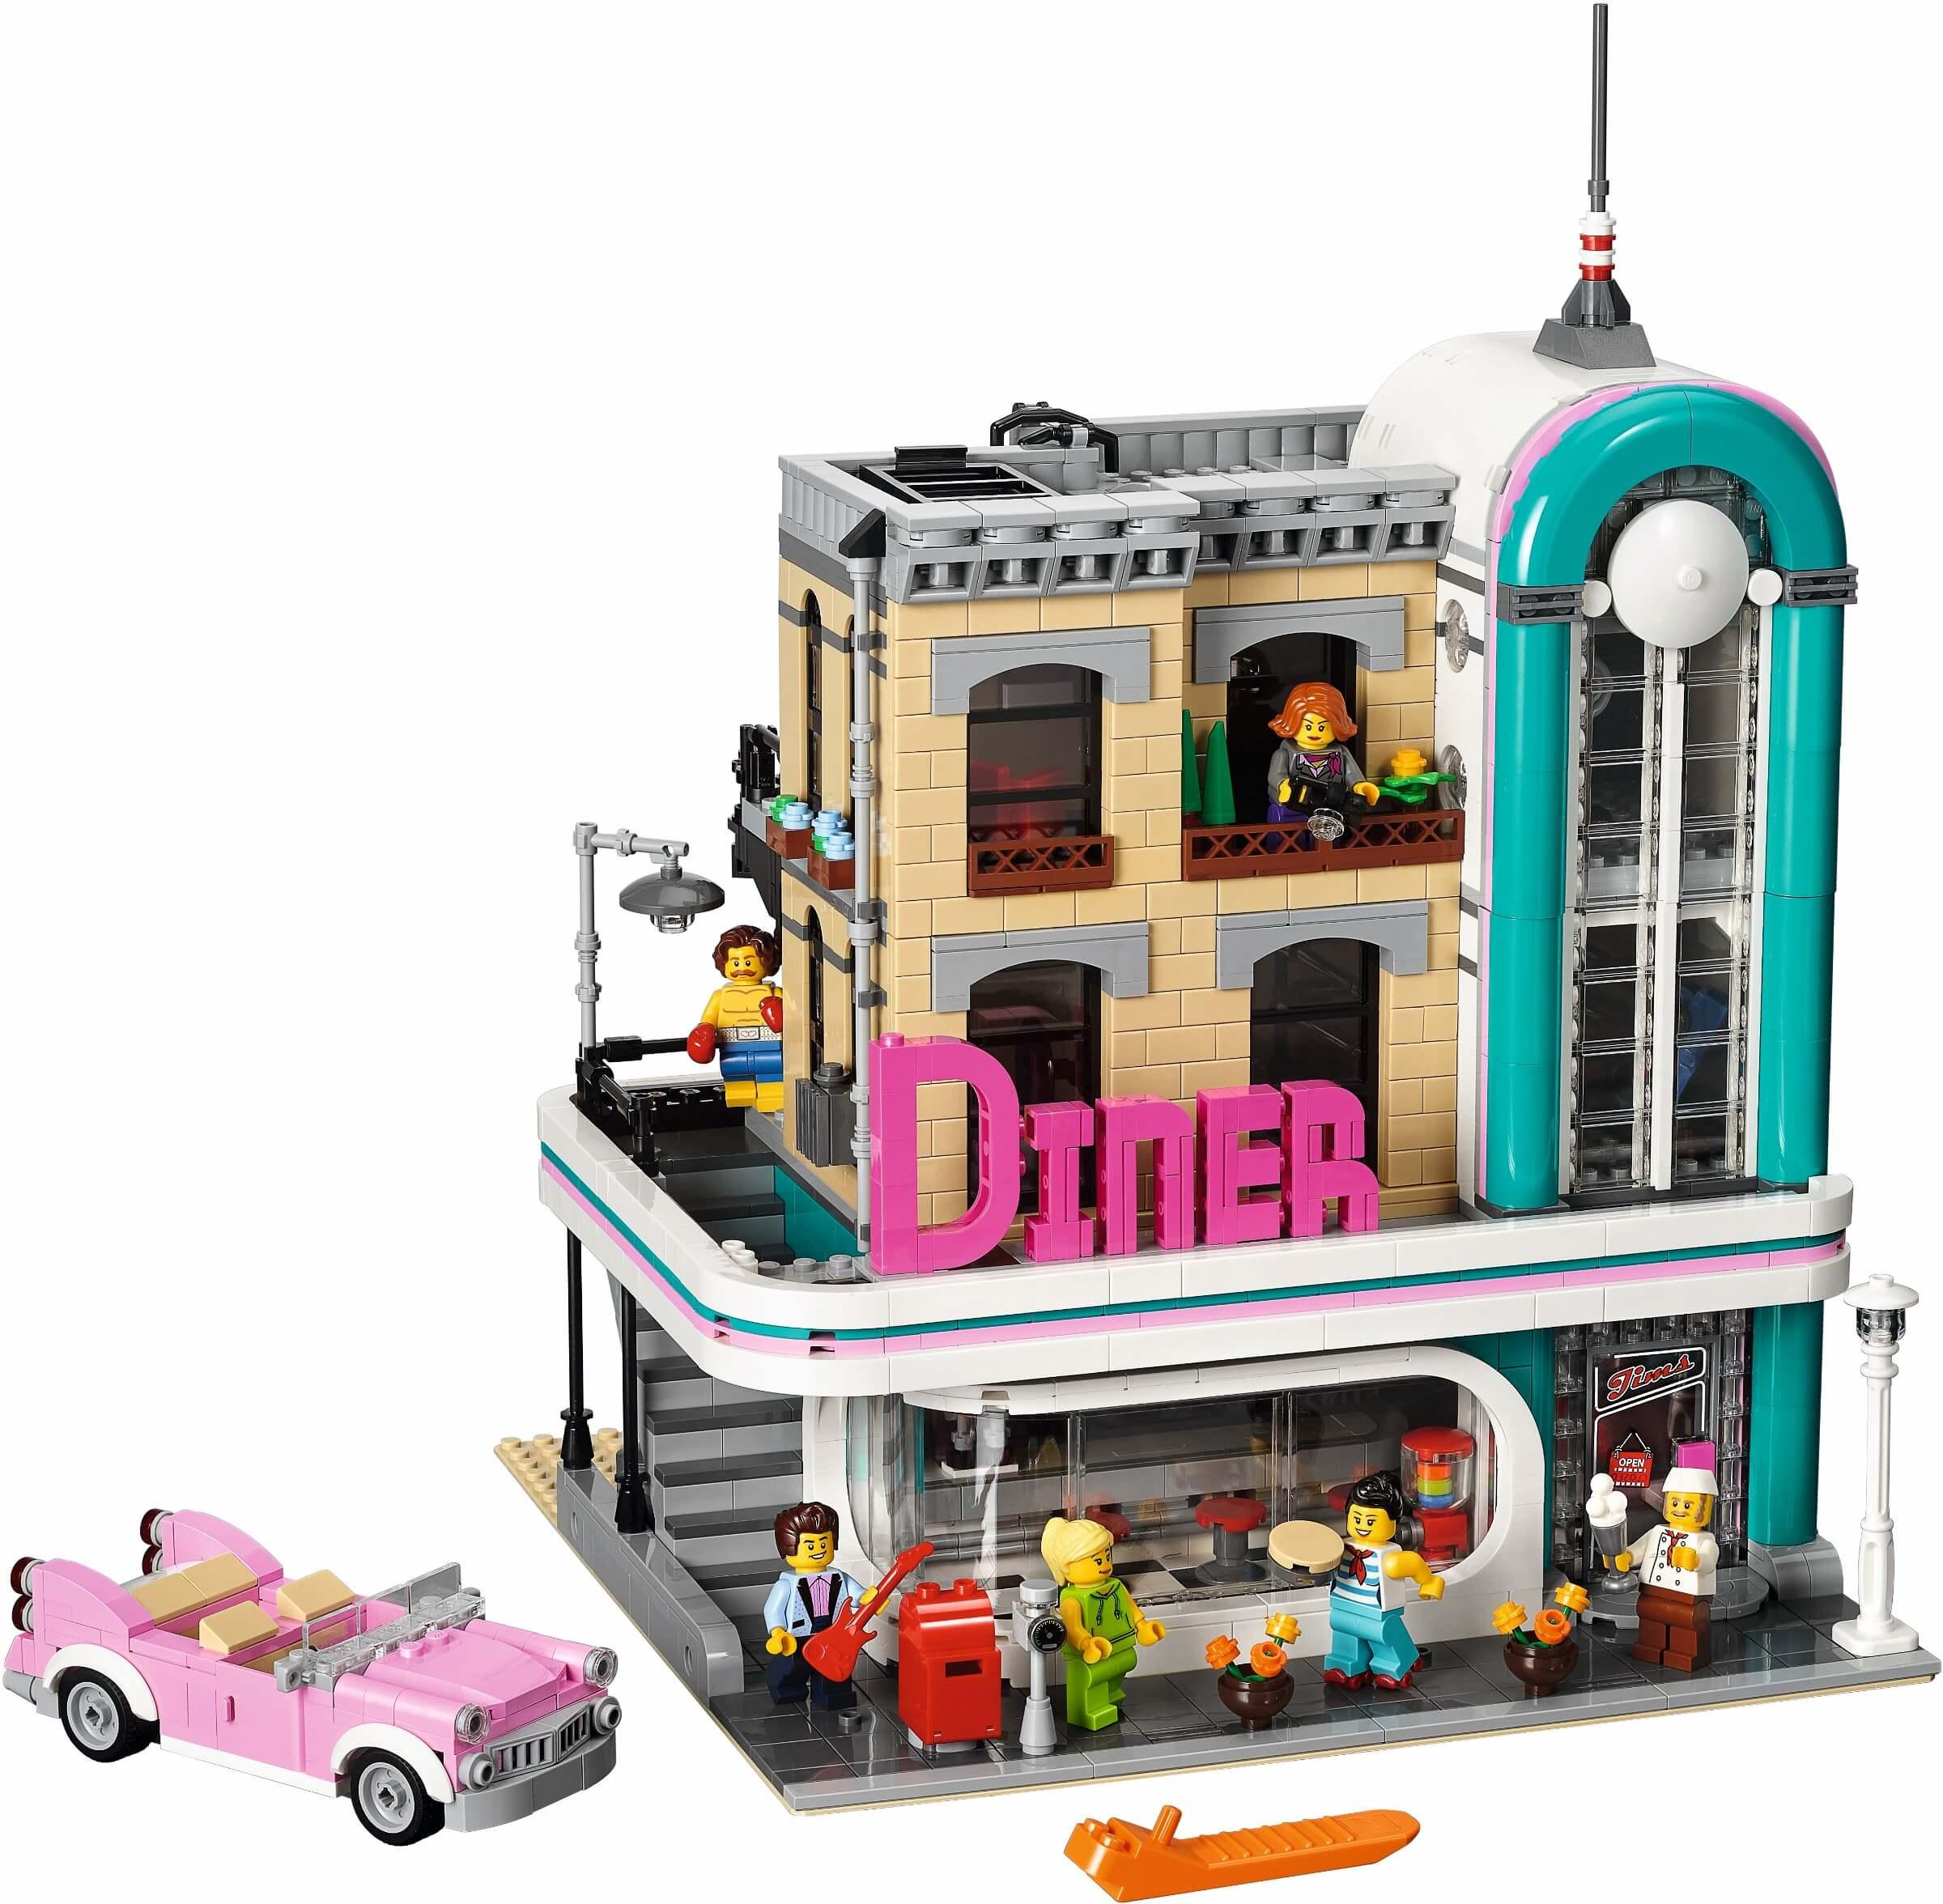 Mua đồ chơi LEGO 10260 - LEGO Creator 10260 - Nhà Hàng (LEGO Creator 10260 Downtown Diner)